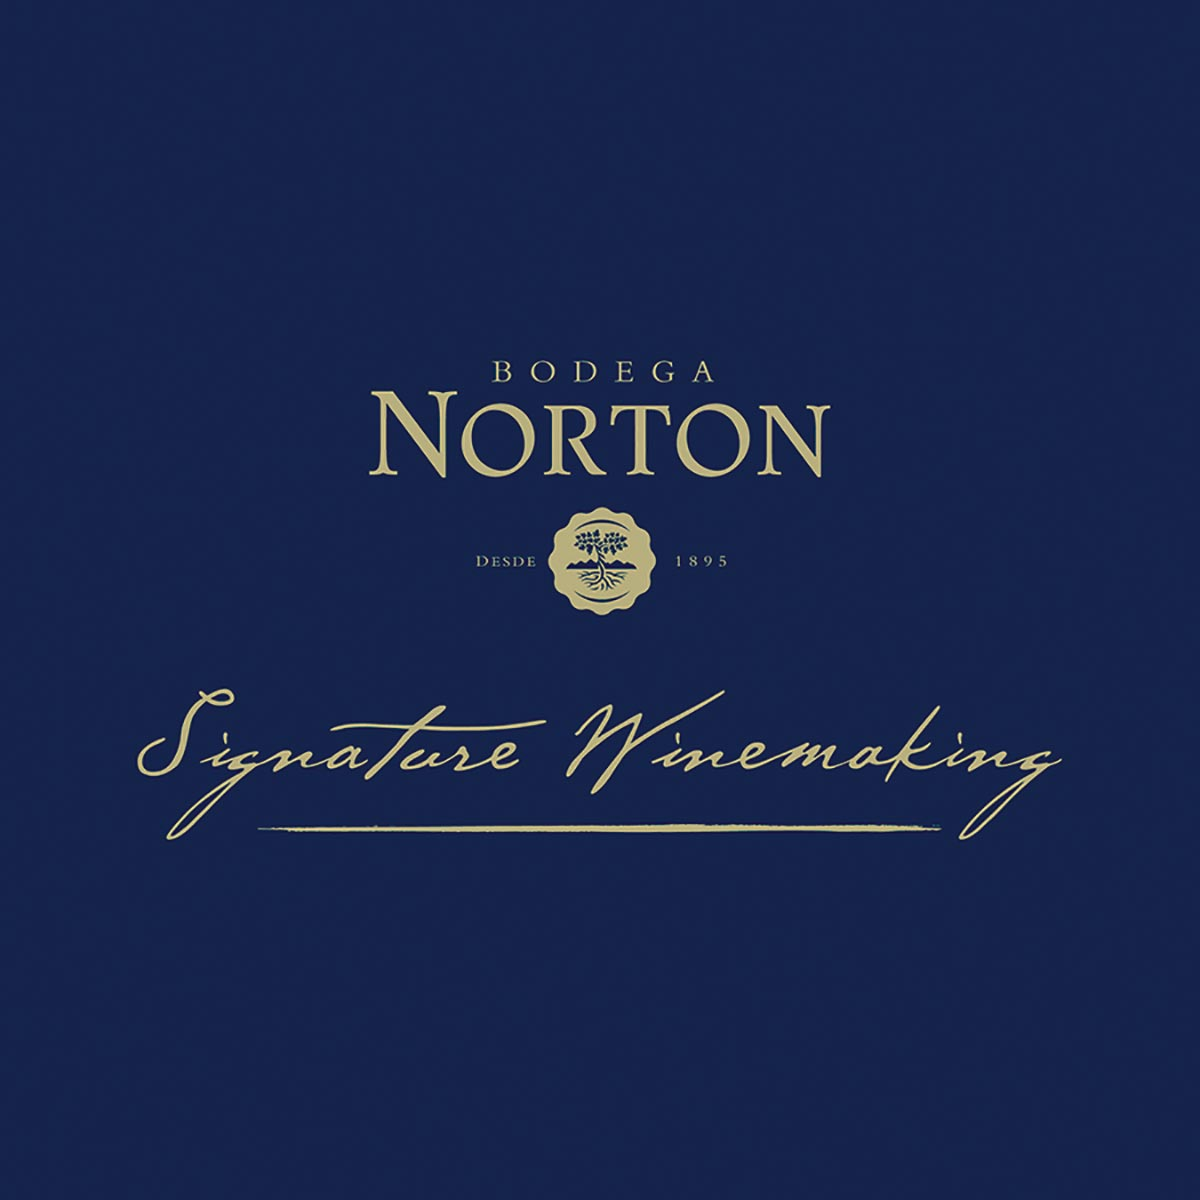 Kobrand Corporation Adds Bodega Norton Wines